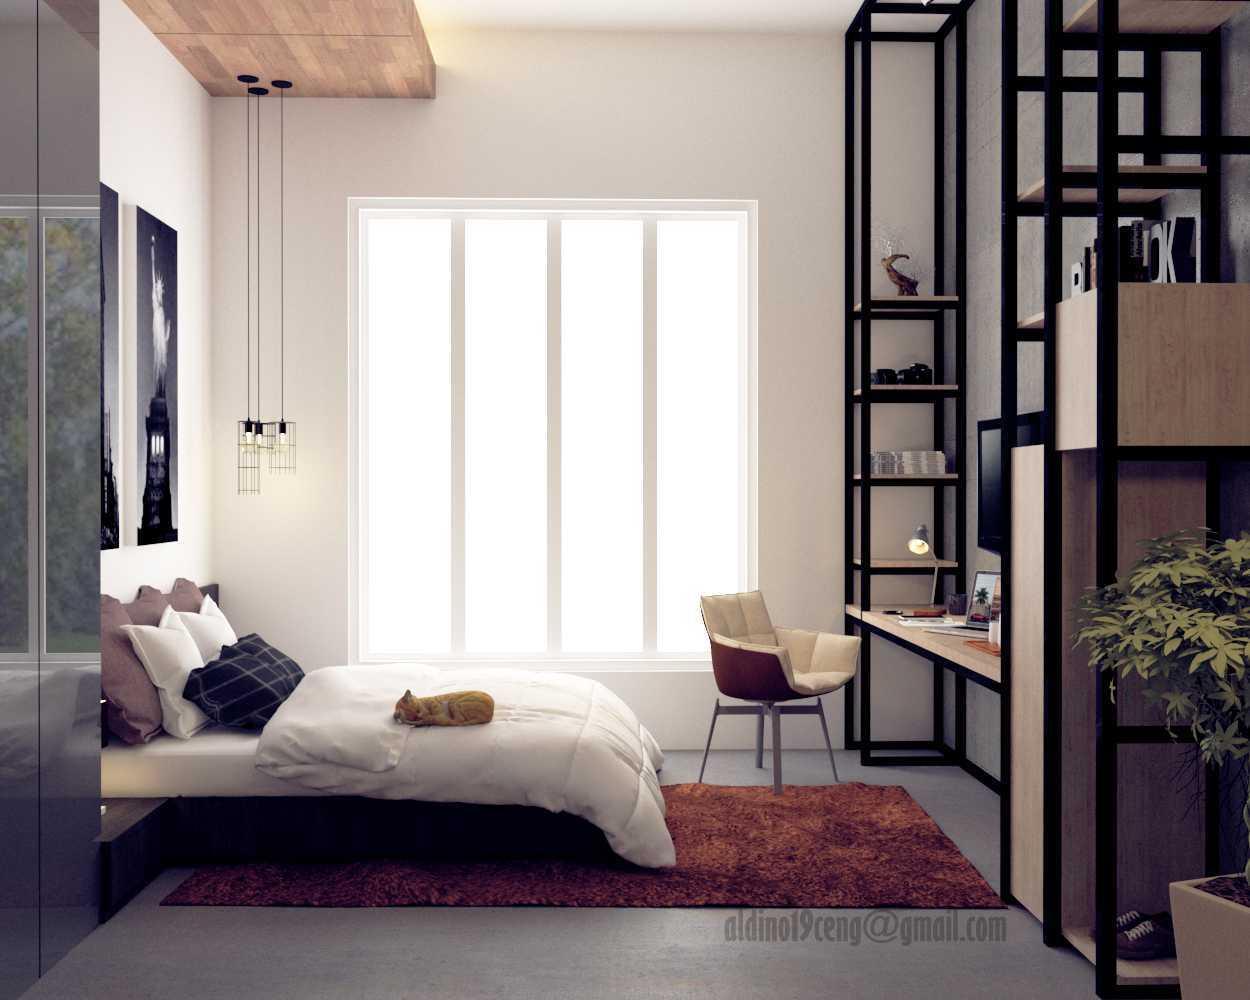 Foto inspirasi ide desain apartemen industrial Bedroom apartement oleh Andi Fauzy Aldino di Arsitag